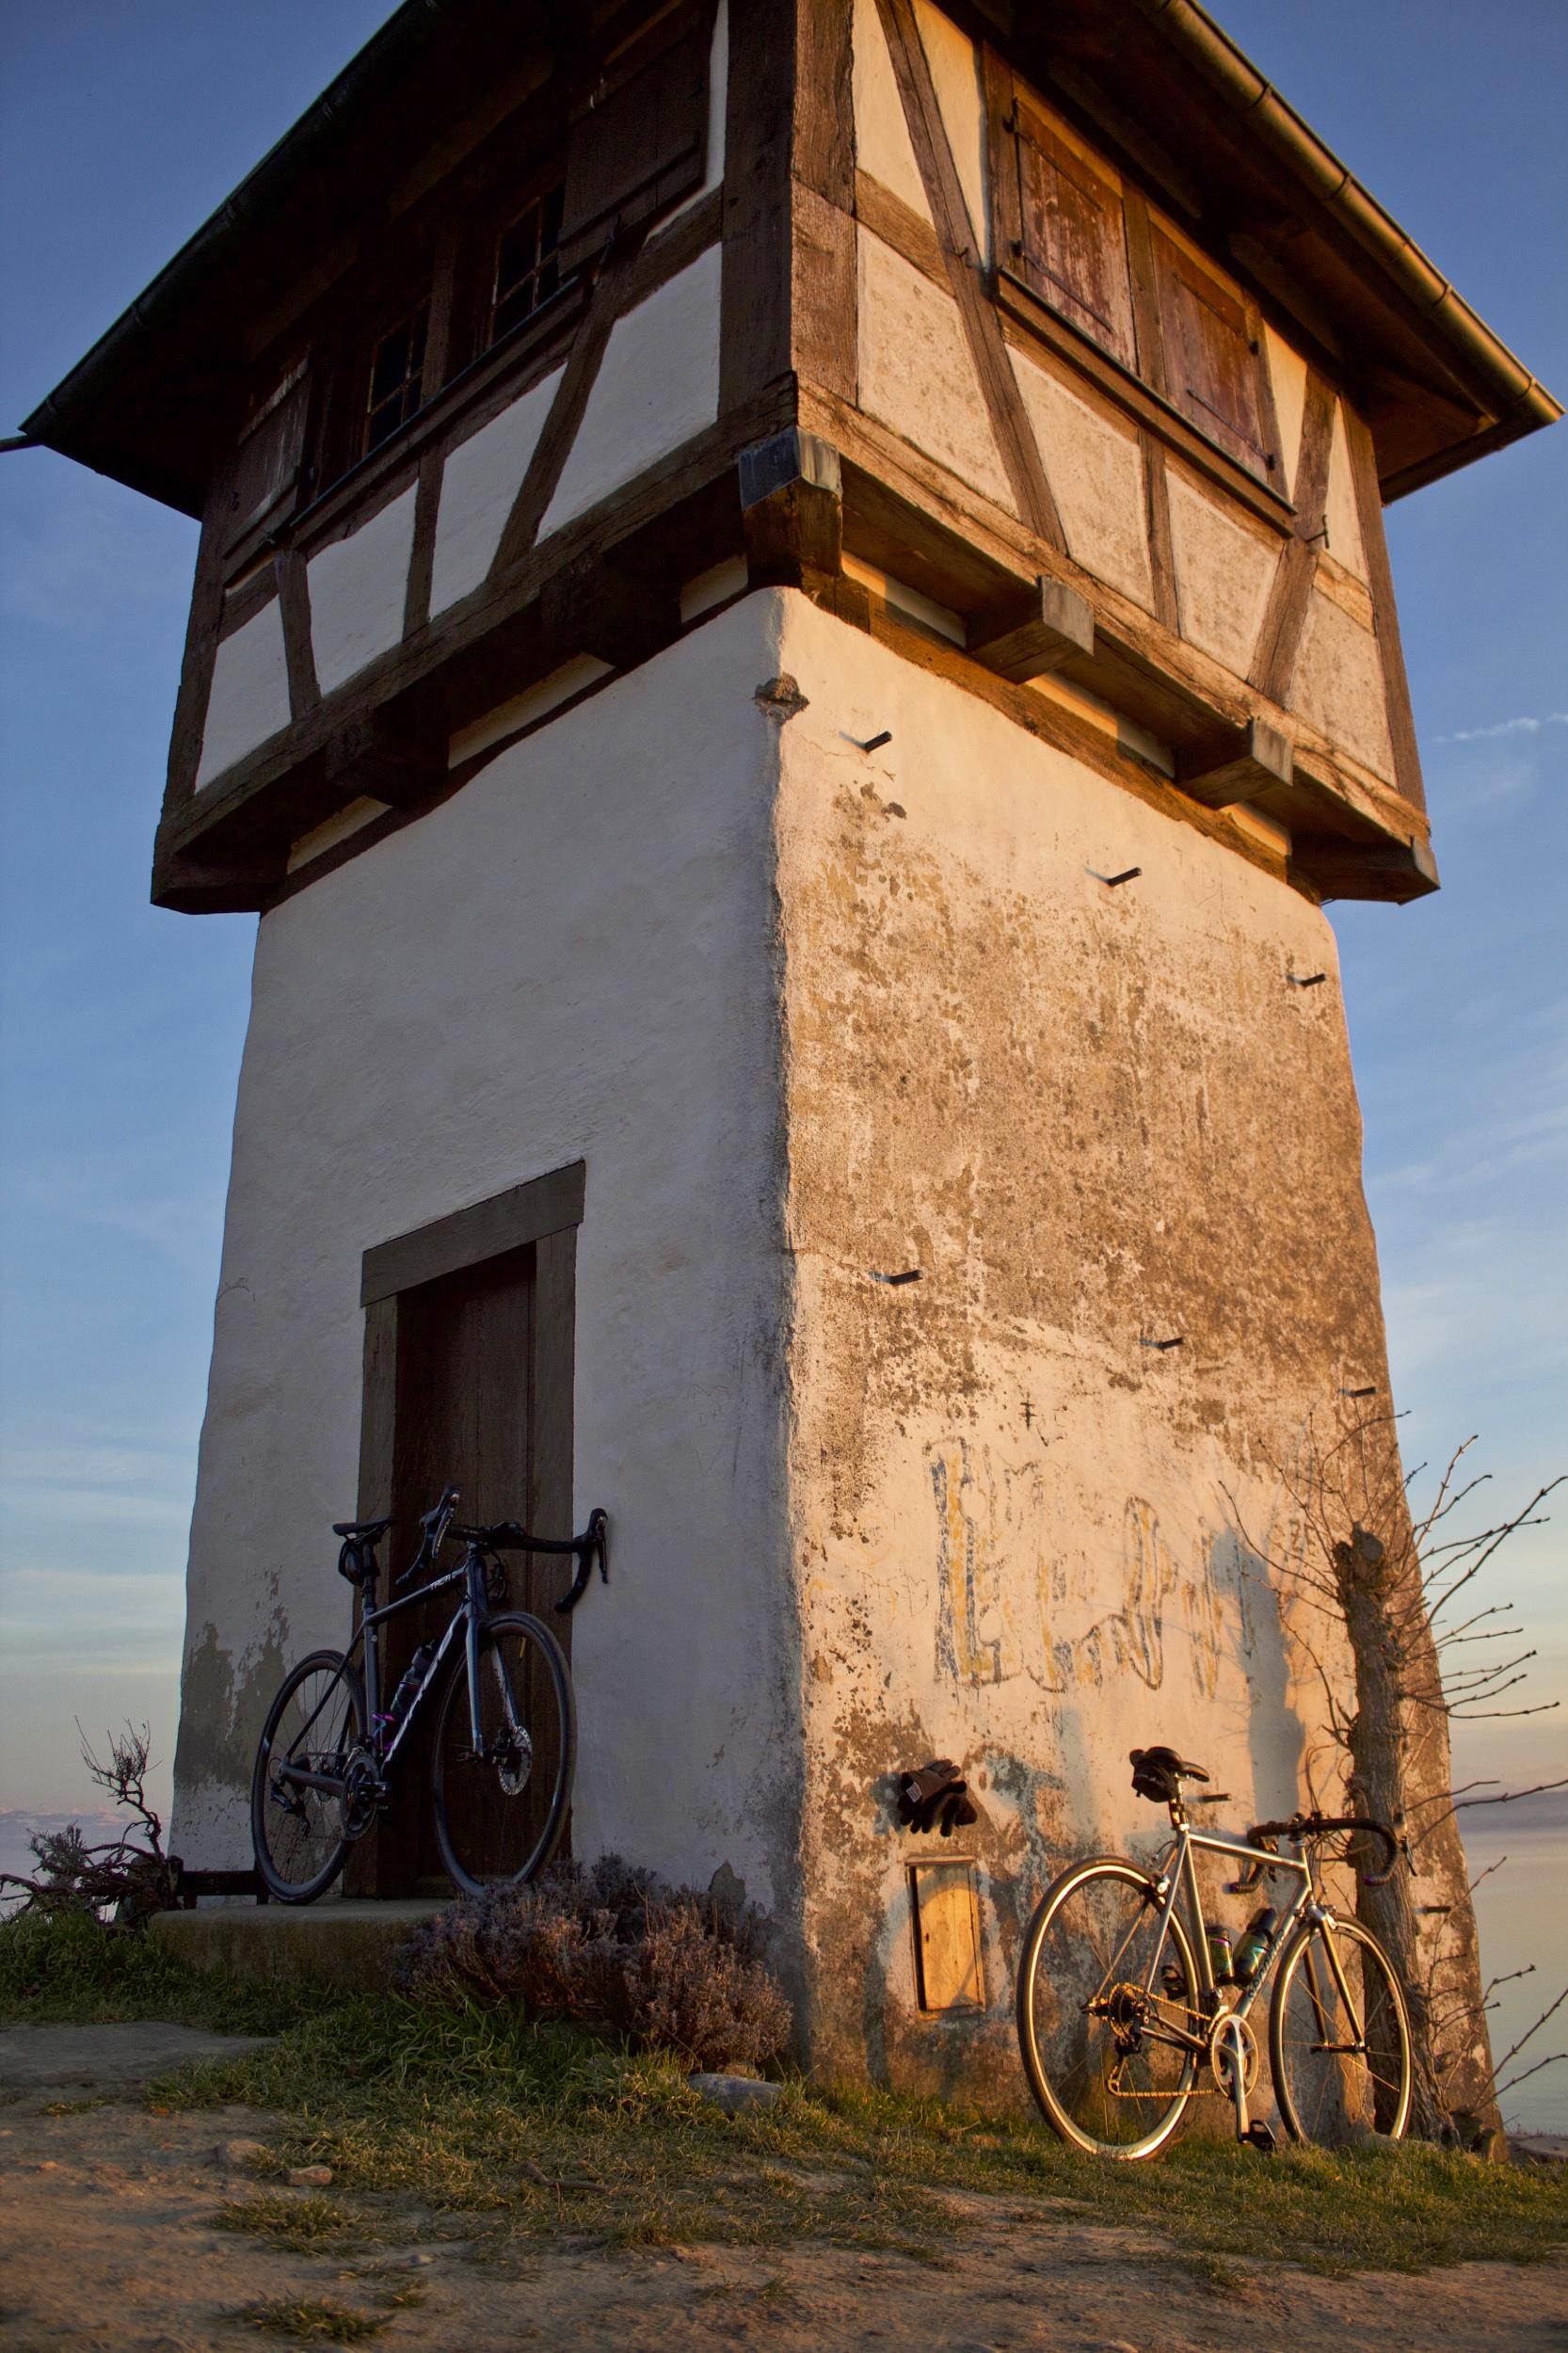 Bikes Against Tower.jpeg